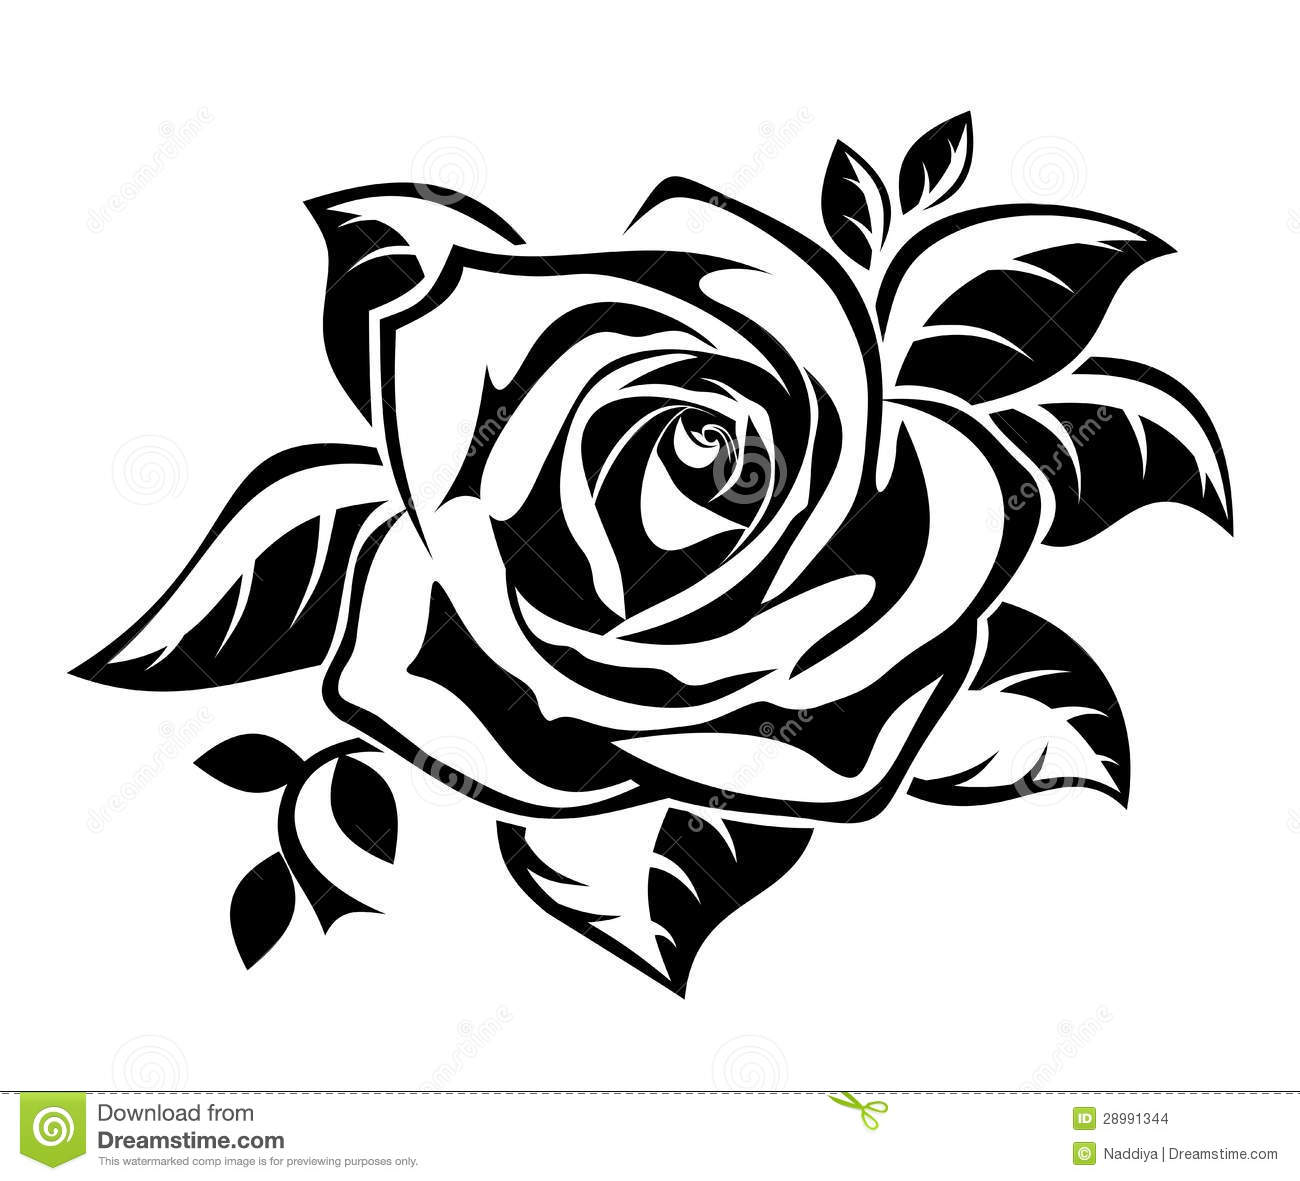 Roses Clip Art Black And White. Vector I-Roses Clip Art Black And White. Vector Illustration Of Black .-15